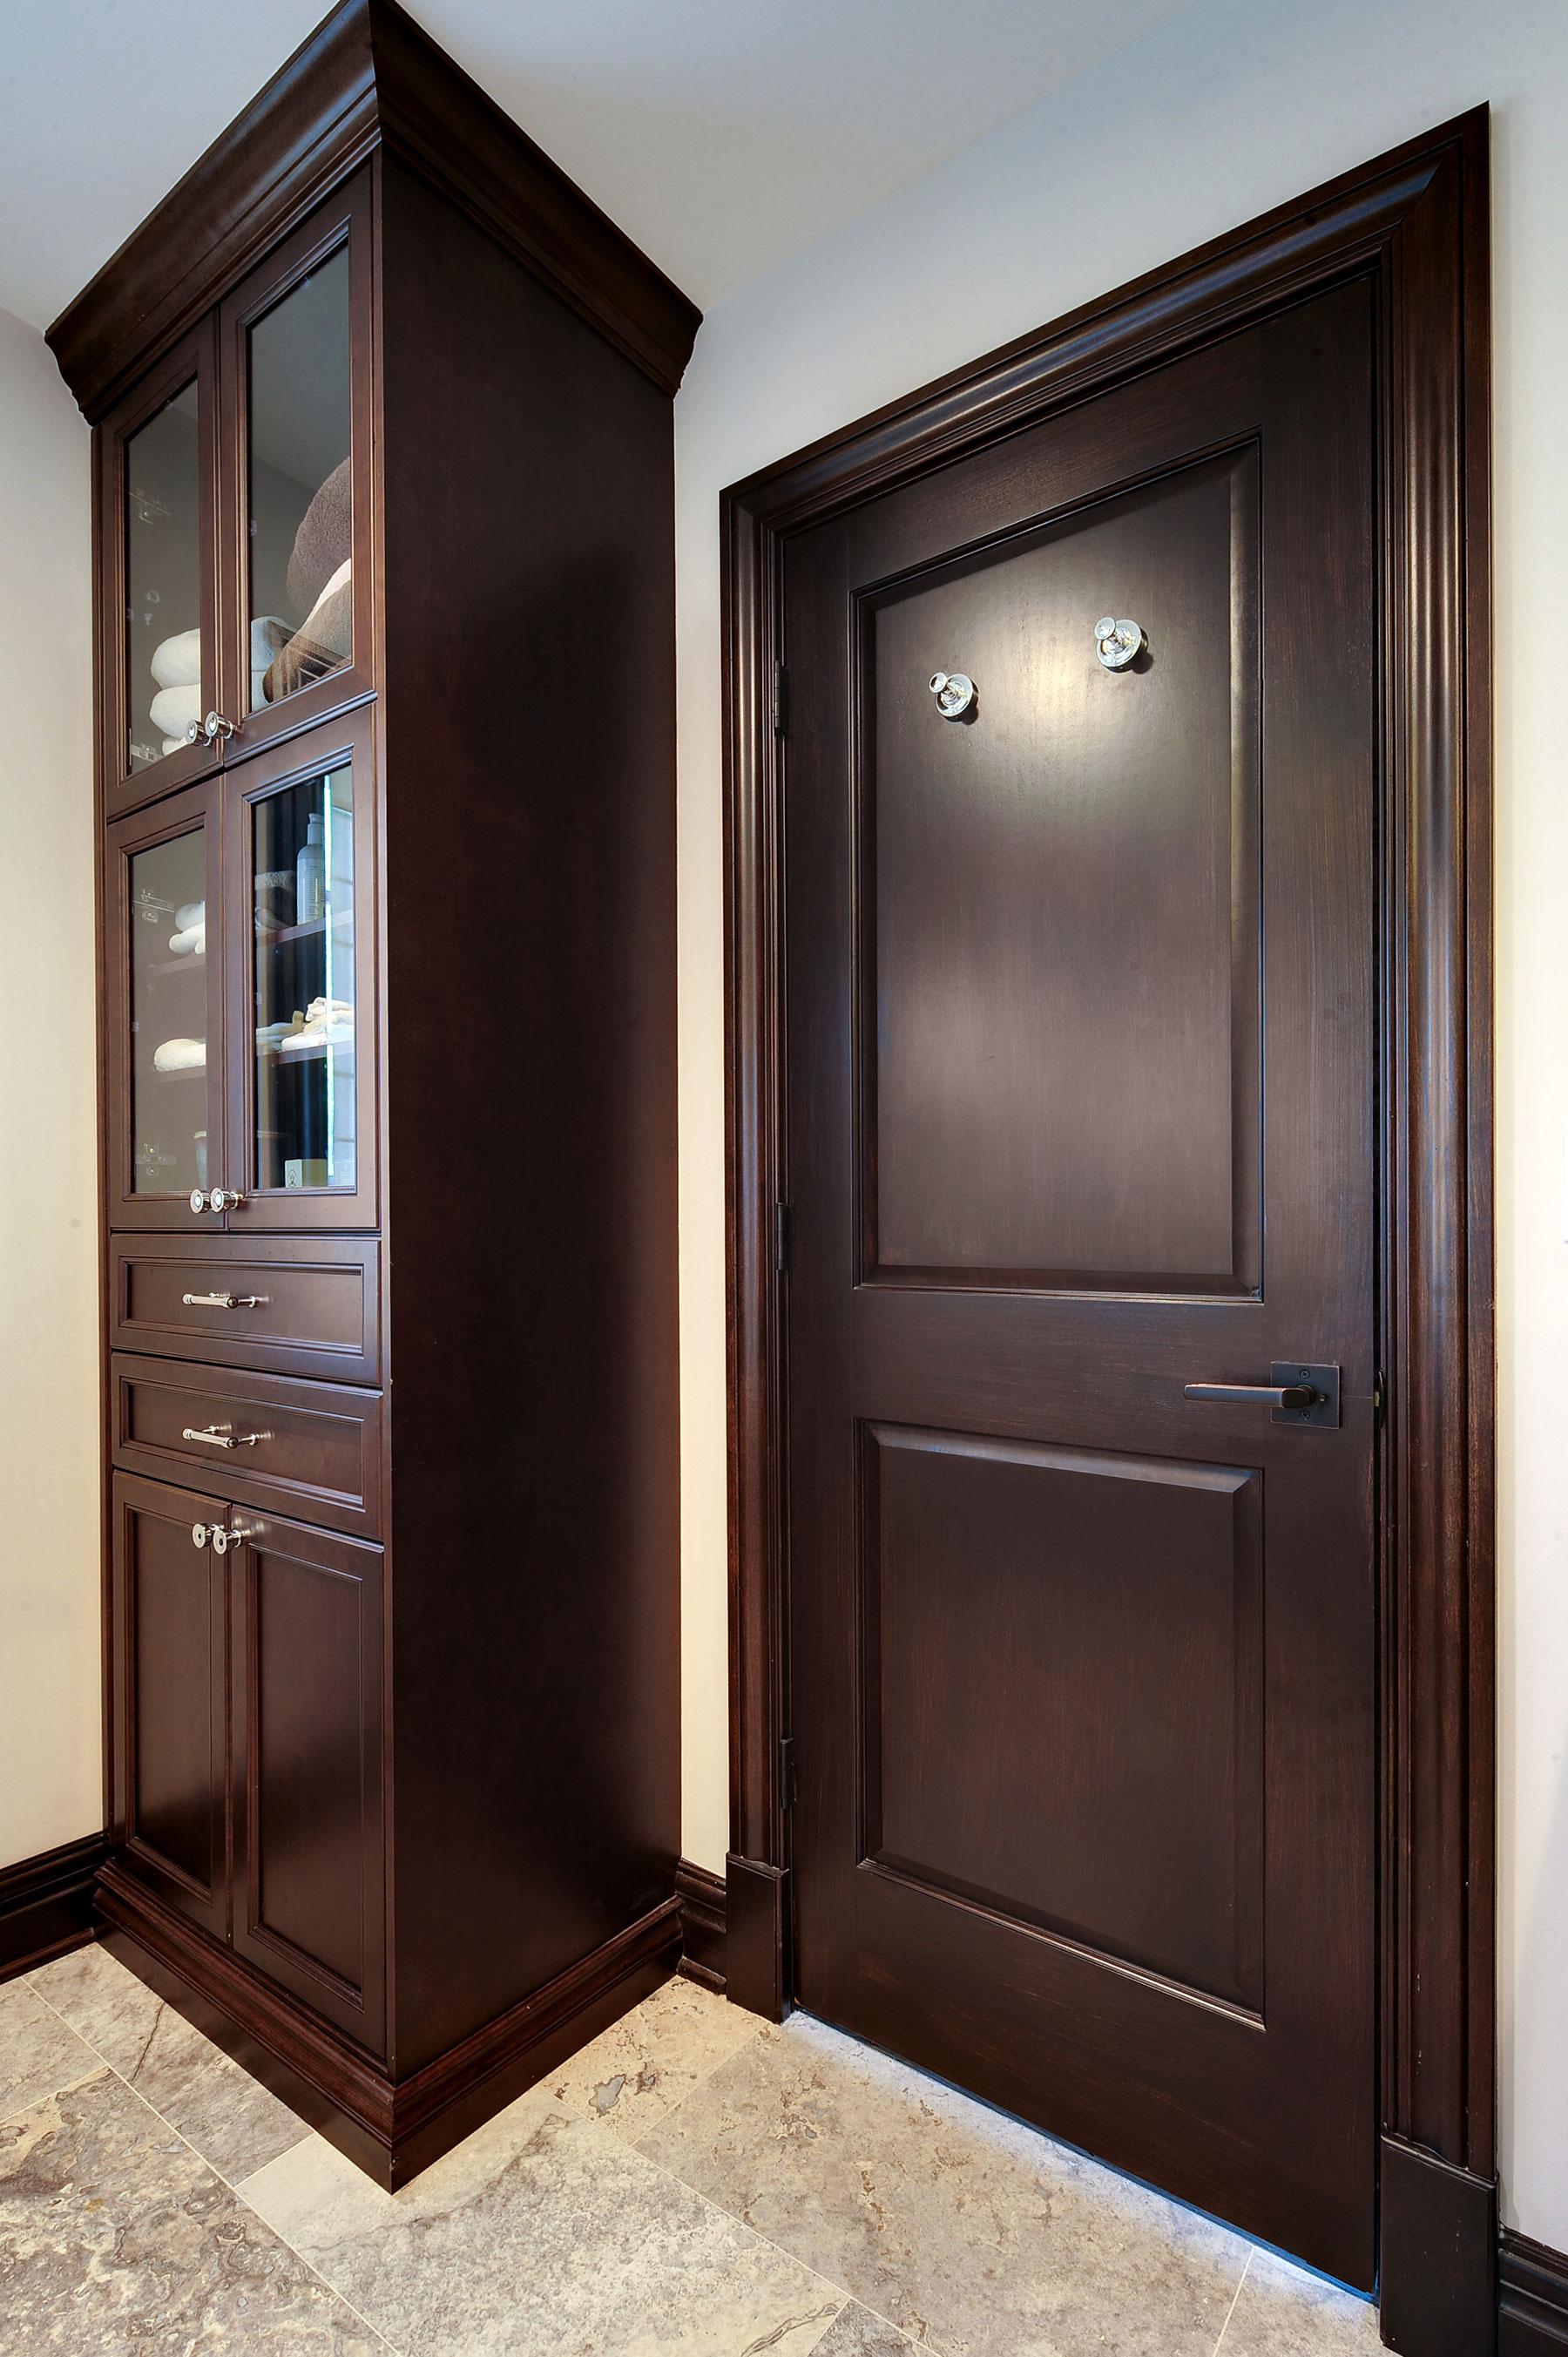 Custom Wood Interior Doors | Custom Interior Solid Wood Door  - Glenview Doors - Custom Doors in Chicago